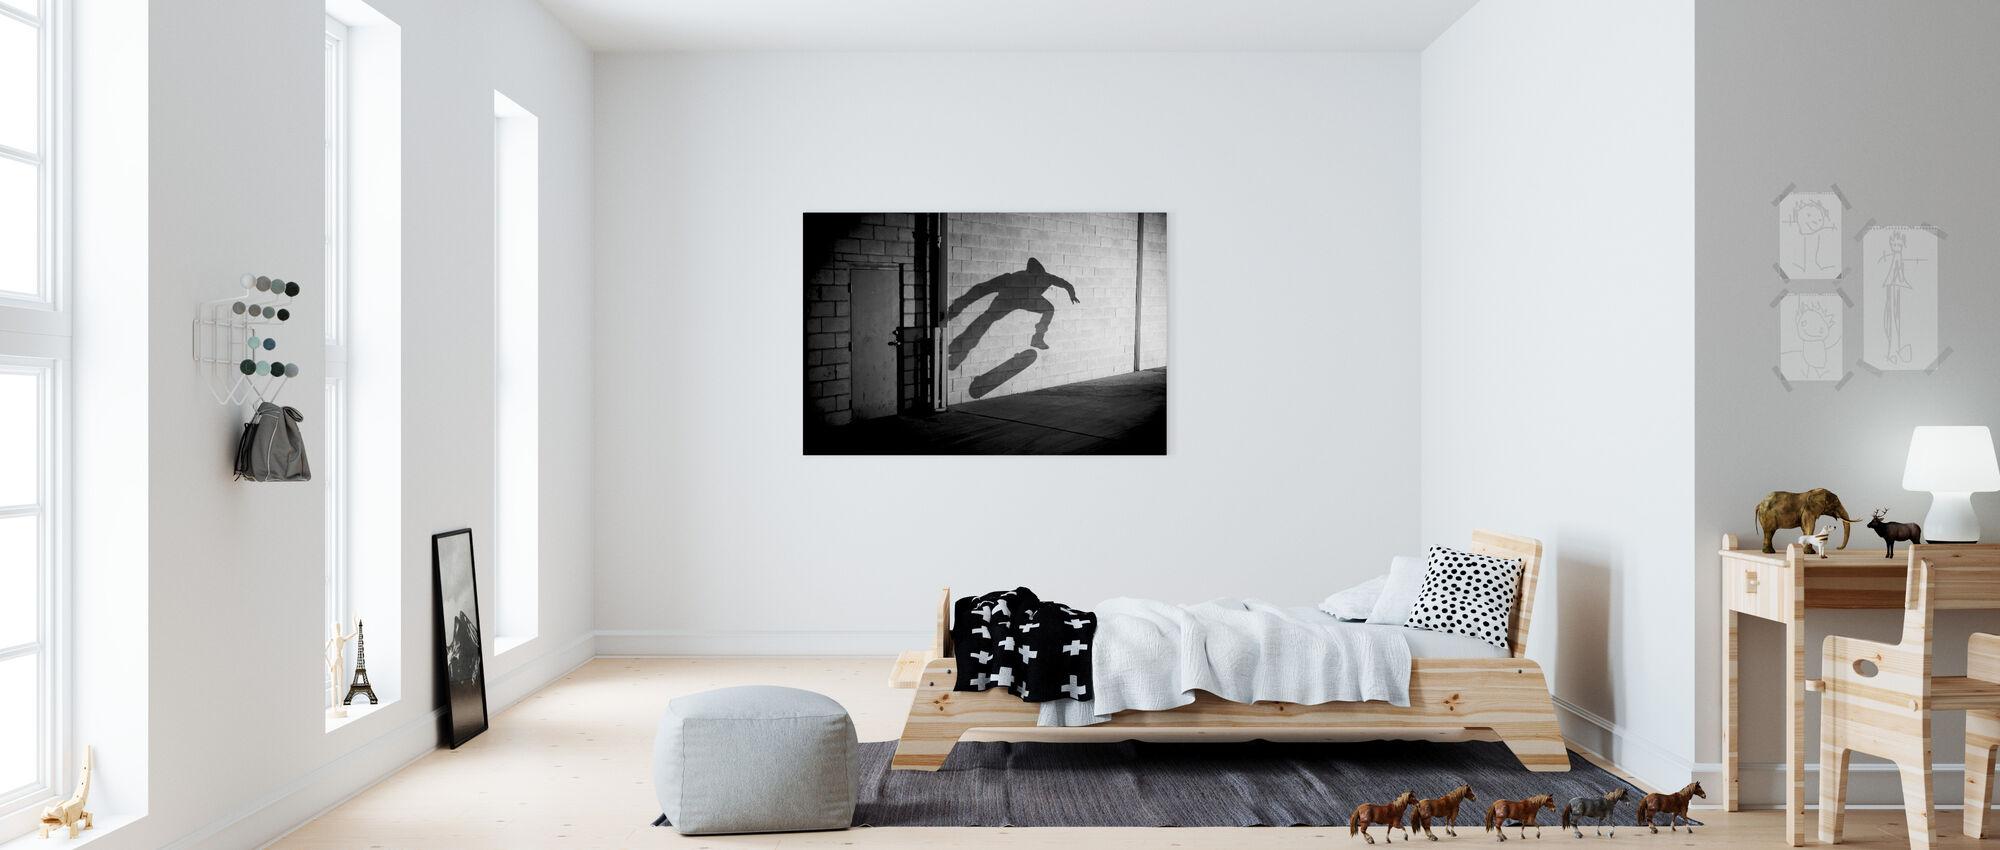 Shadow Skateboarder - Canvas print - Kids Room